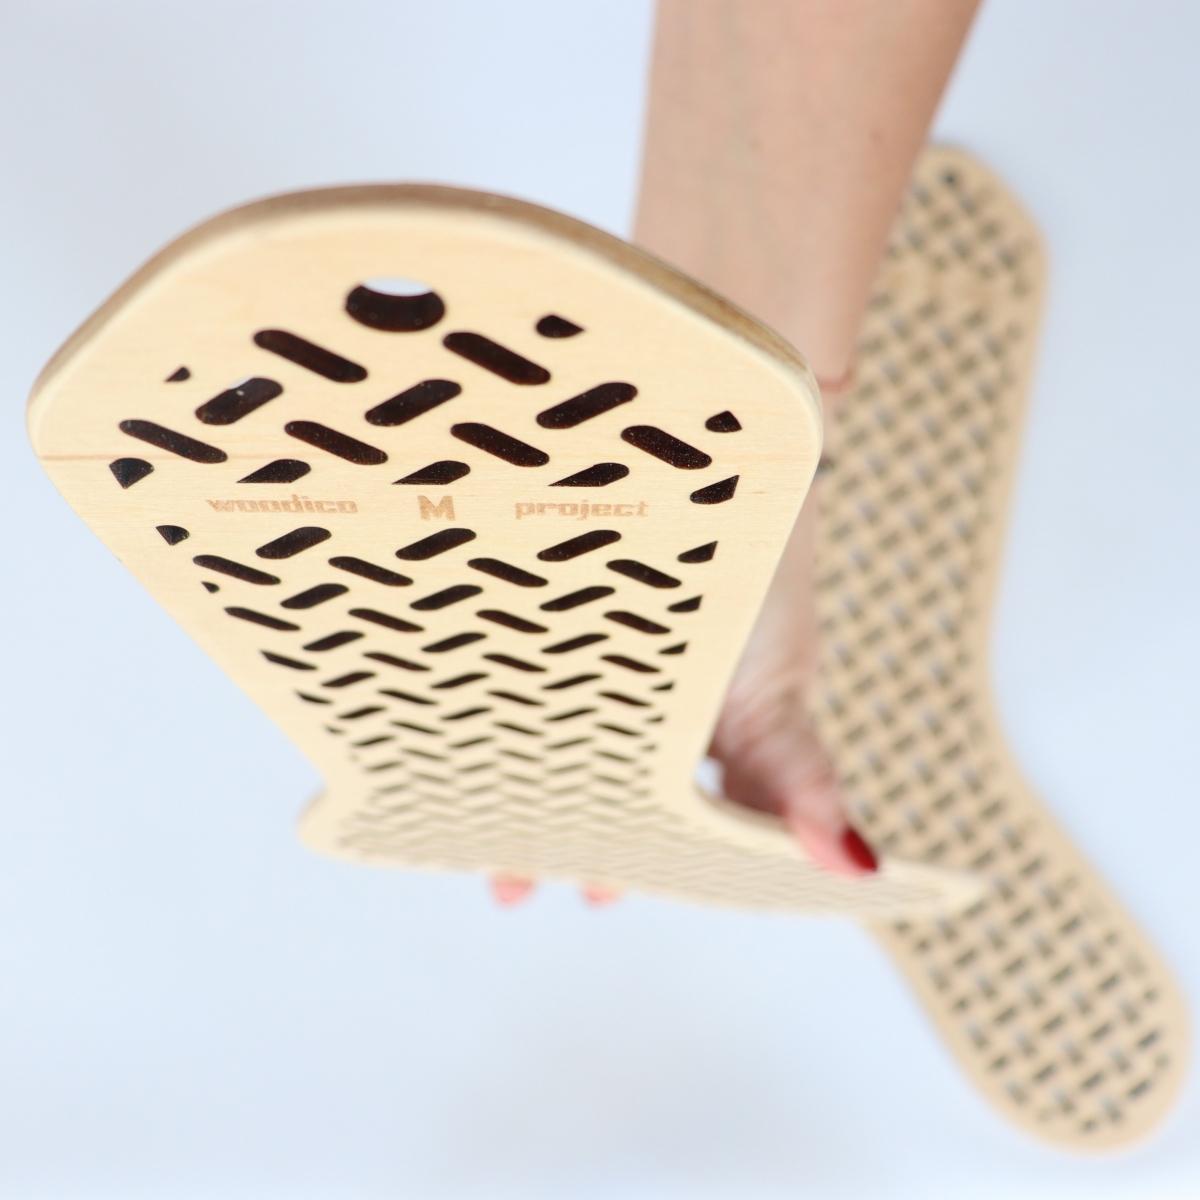 woodico.pro wooden sock blockers stitches 3 1200x1200 - Wooden sock blockers / Stitches